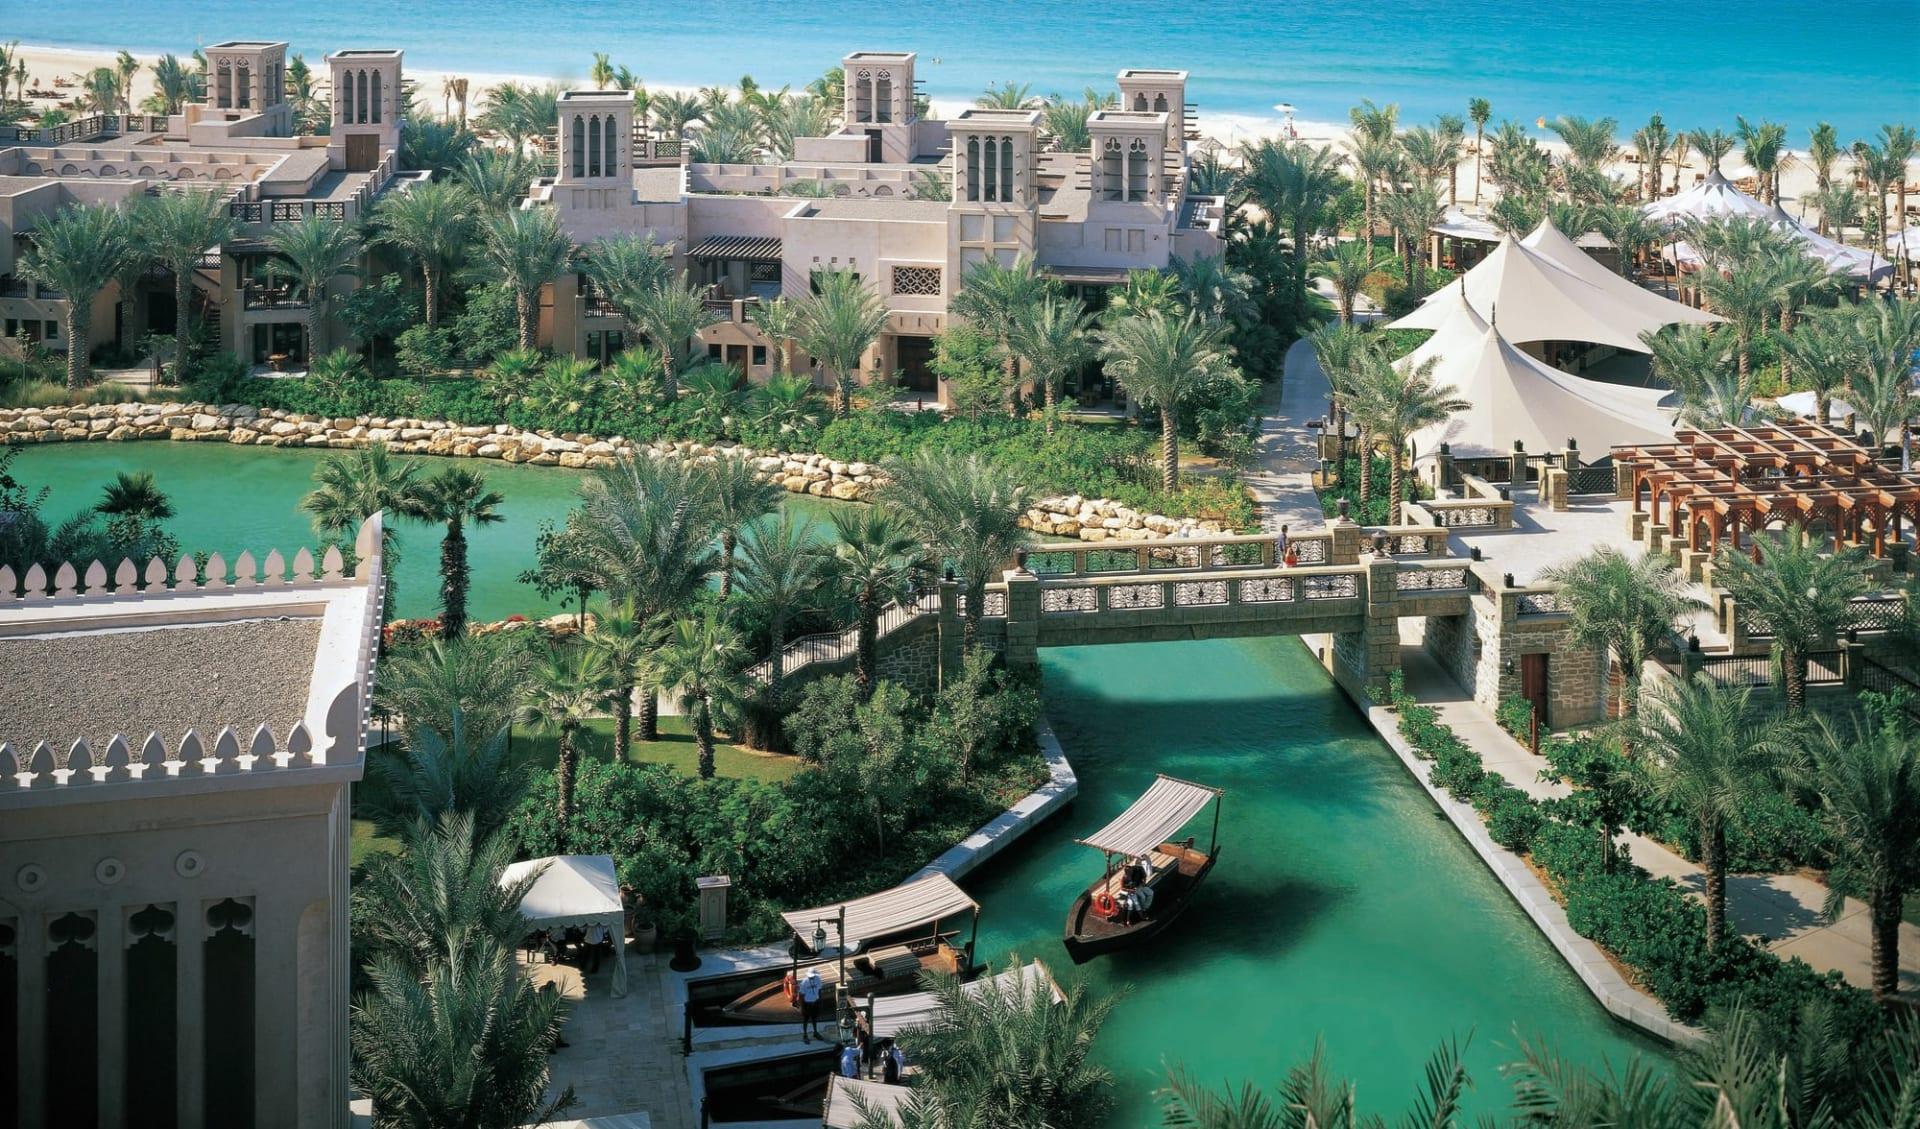 Jumeirah Dar al Masyaf in Dubai: